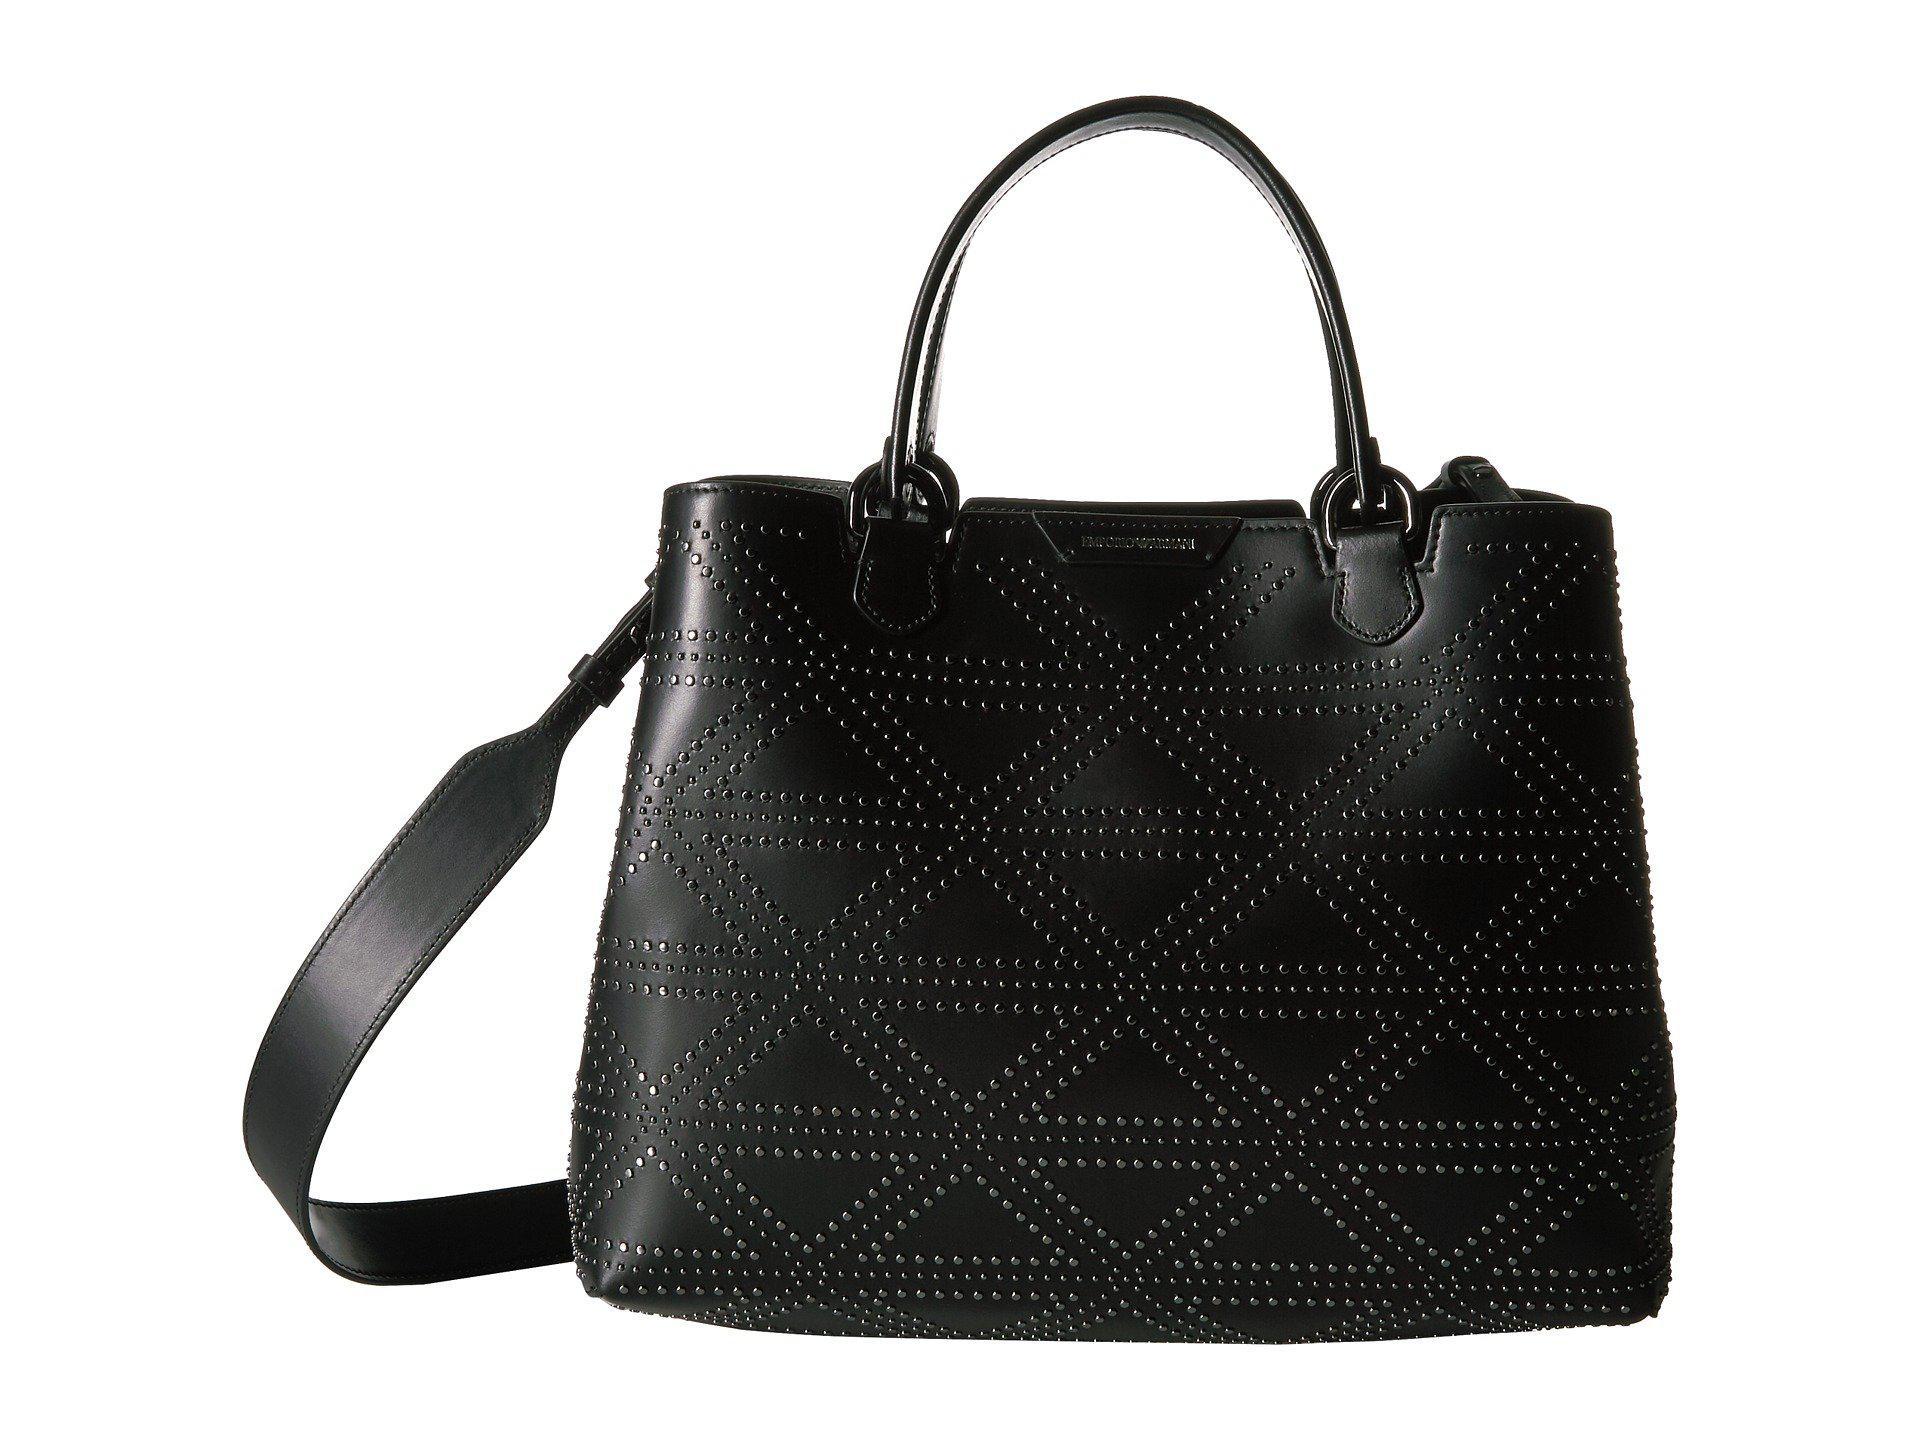 Lyst - Emporio Armani Shopping Vacchetta+borchie - Medium Shopping ... 559e8bcf754cc